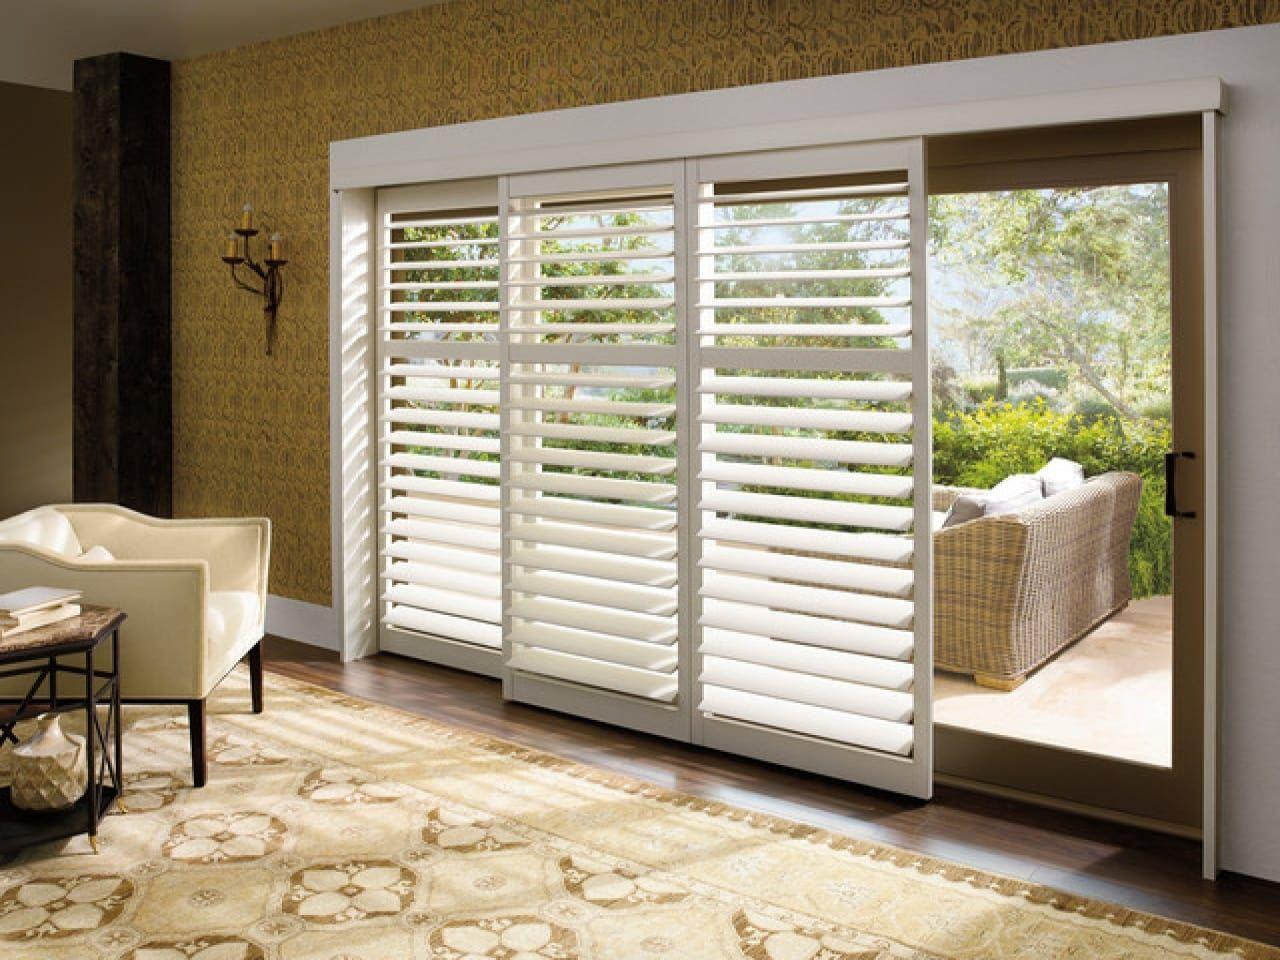 Window Treatments For Sliding Glass Doors 2020 Ideas Tips Sliding Doors Interior Sliding Door Blinds Sliding Glass Door